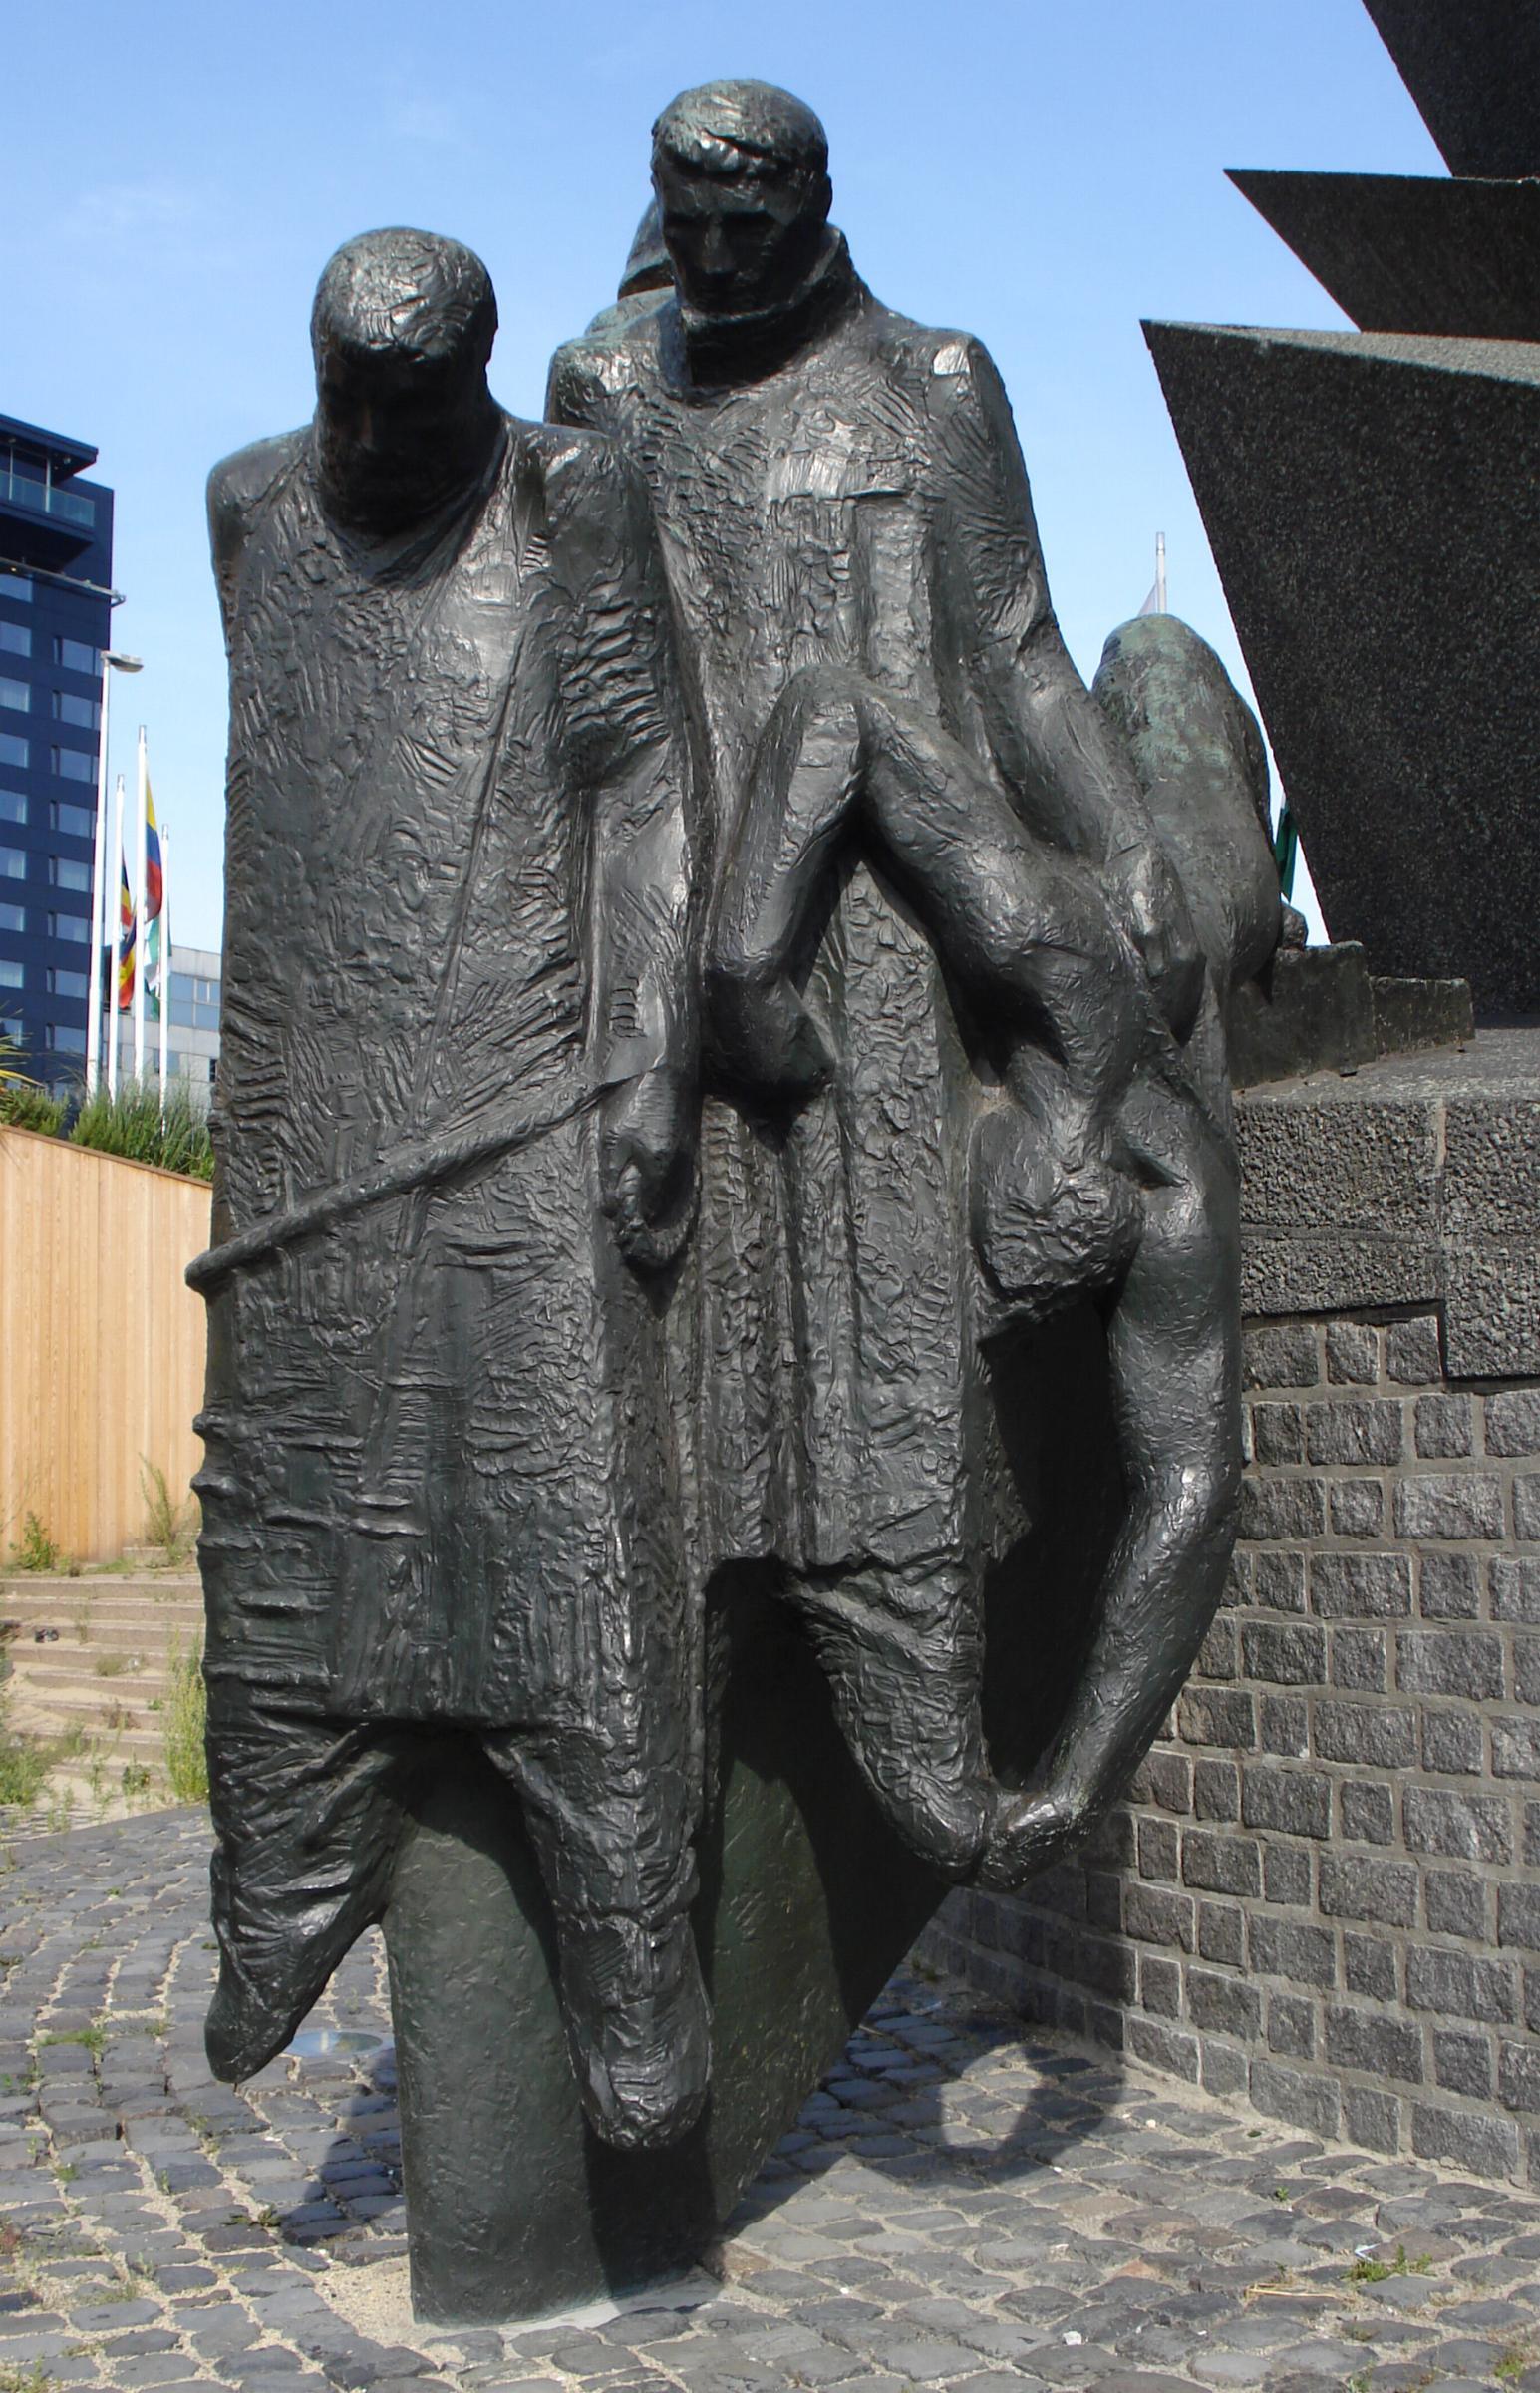 Citaten Kunst En Cultuur : Kunst en cultuur in rotterdam wikipedia